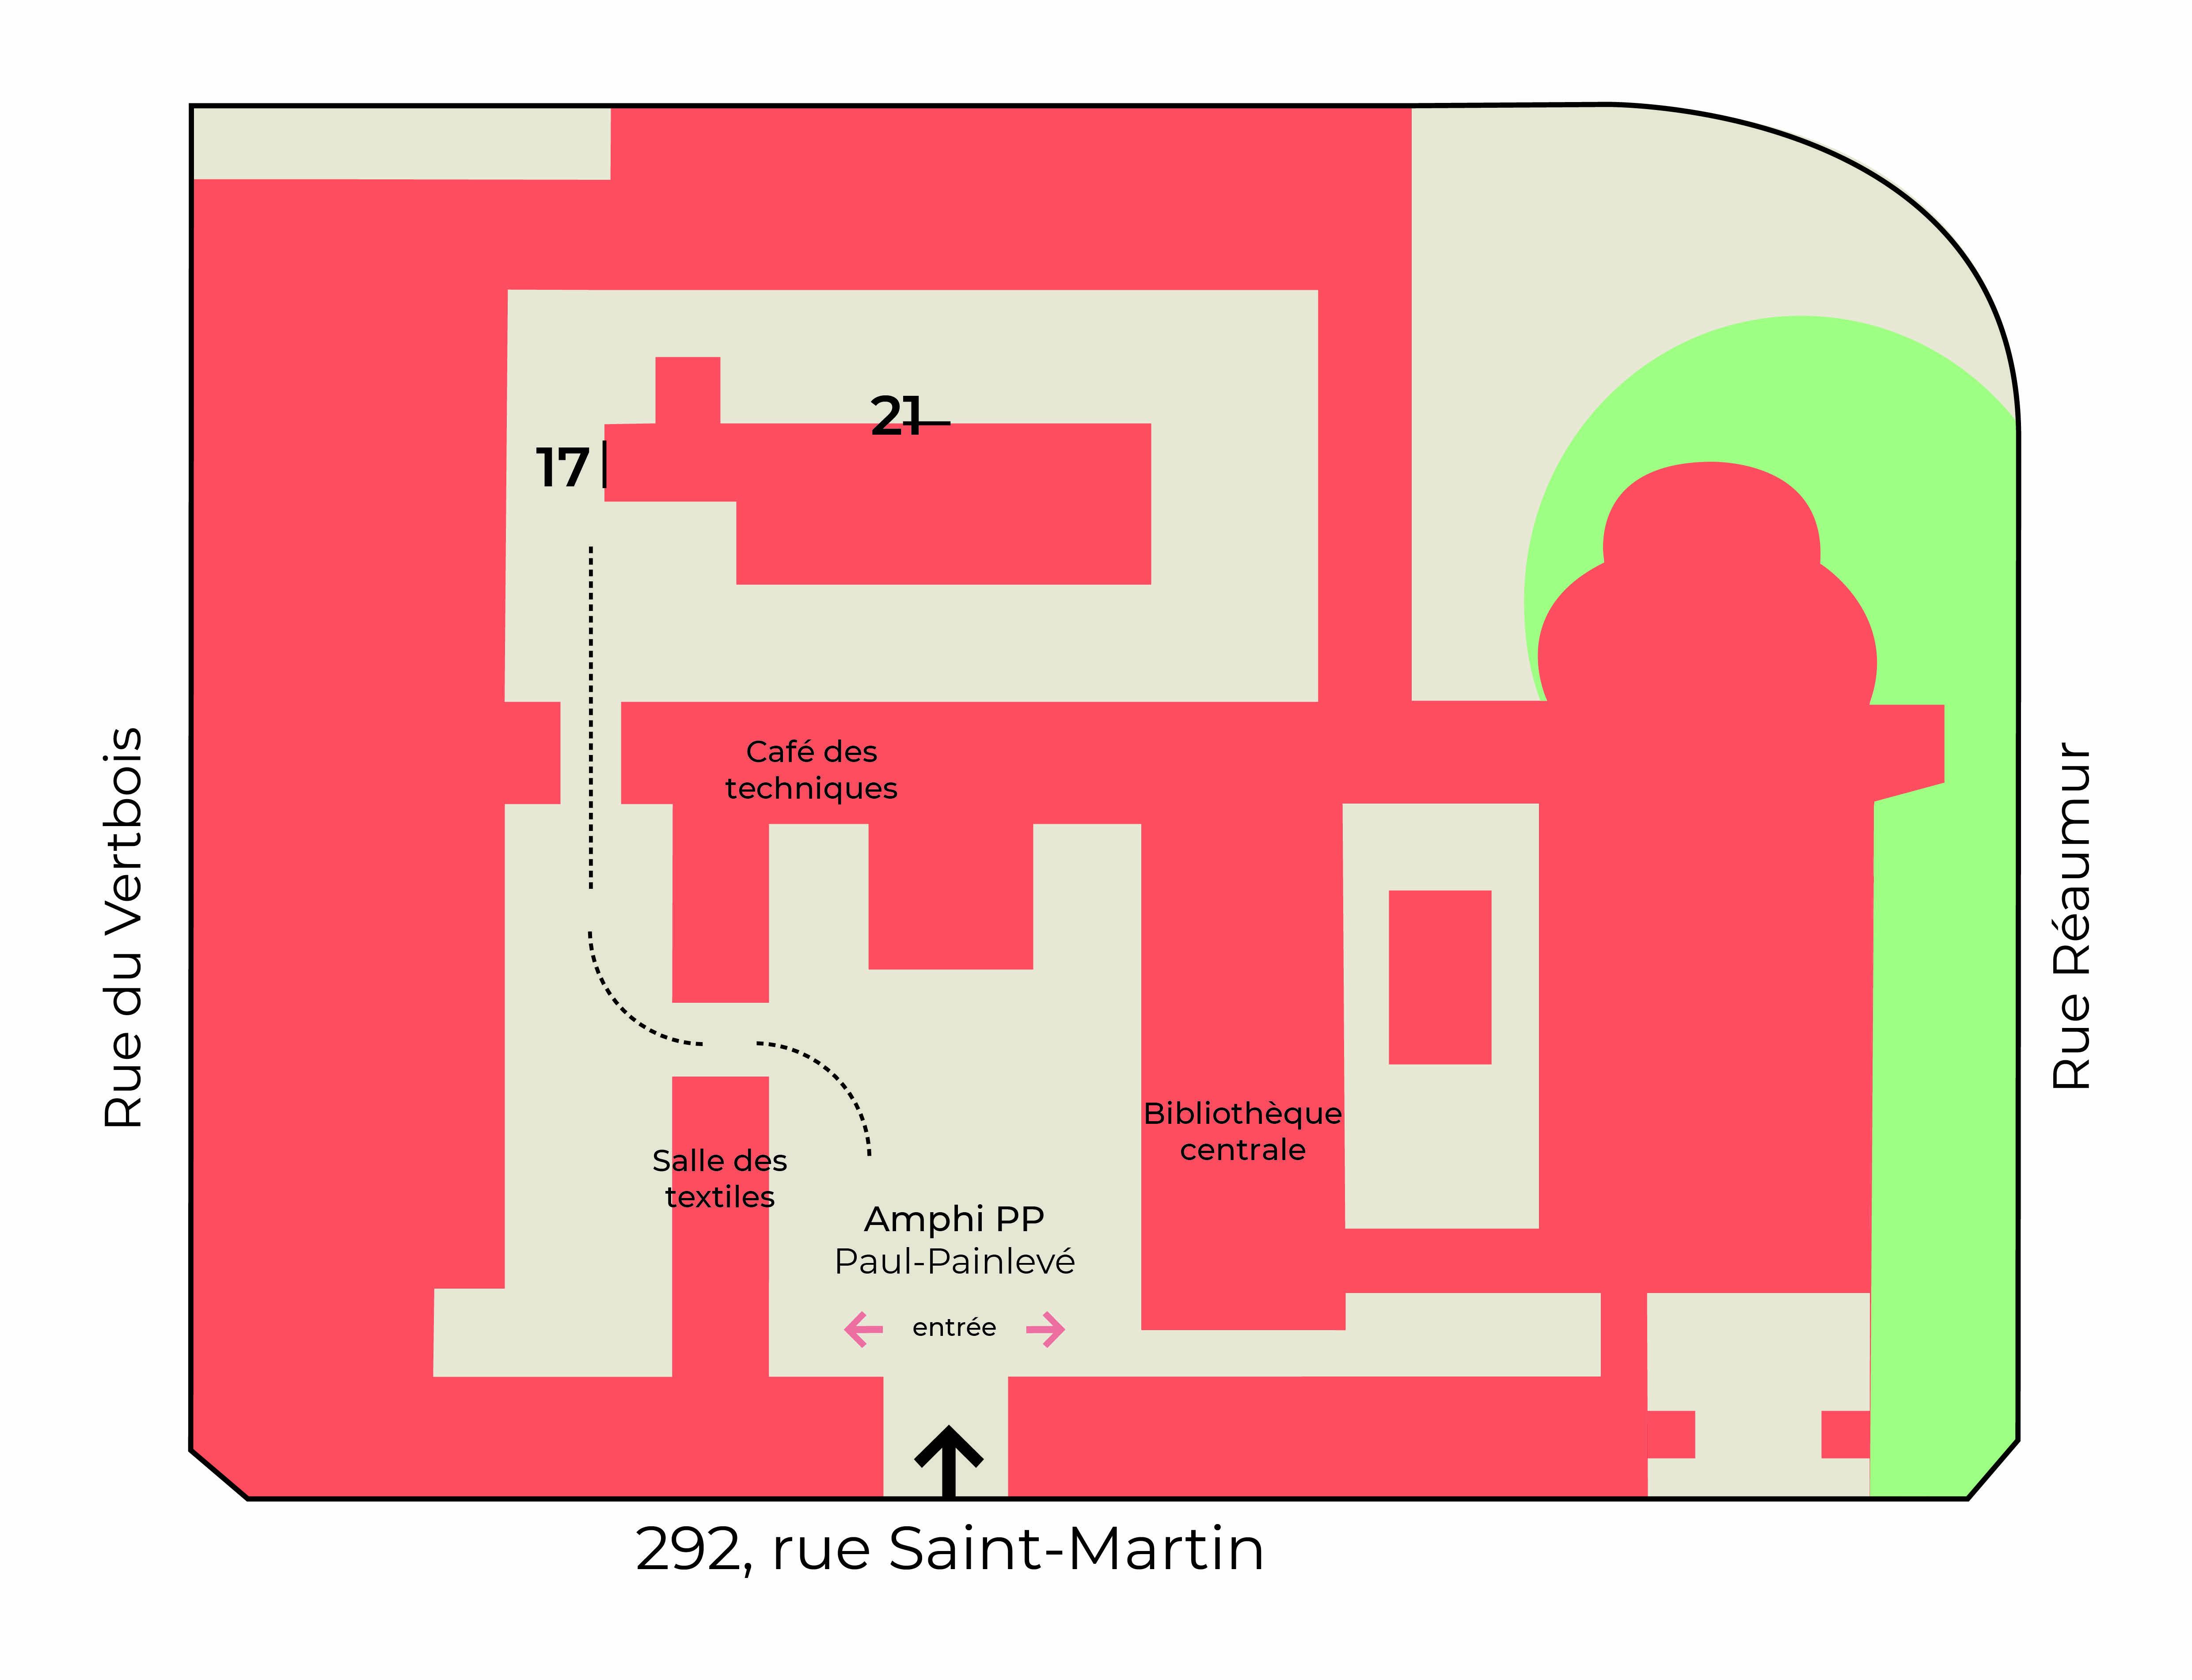 Plan Cnam Forum recherche partanariale